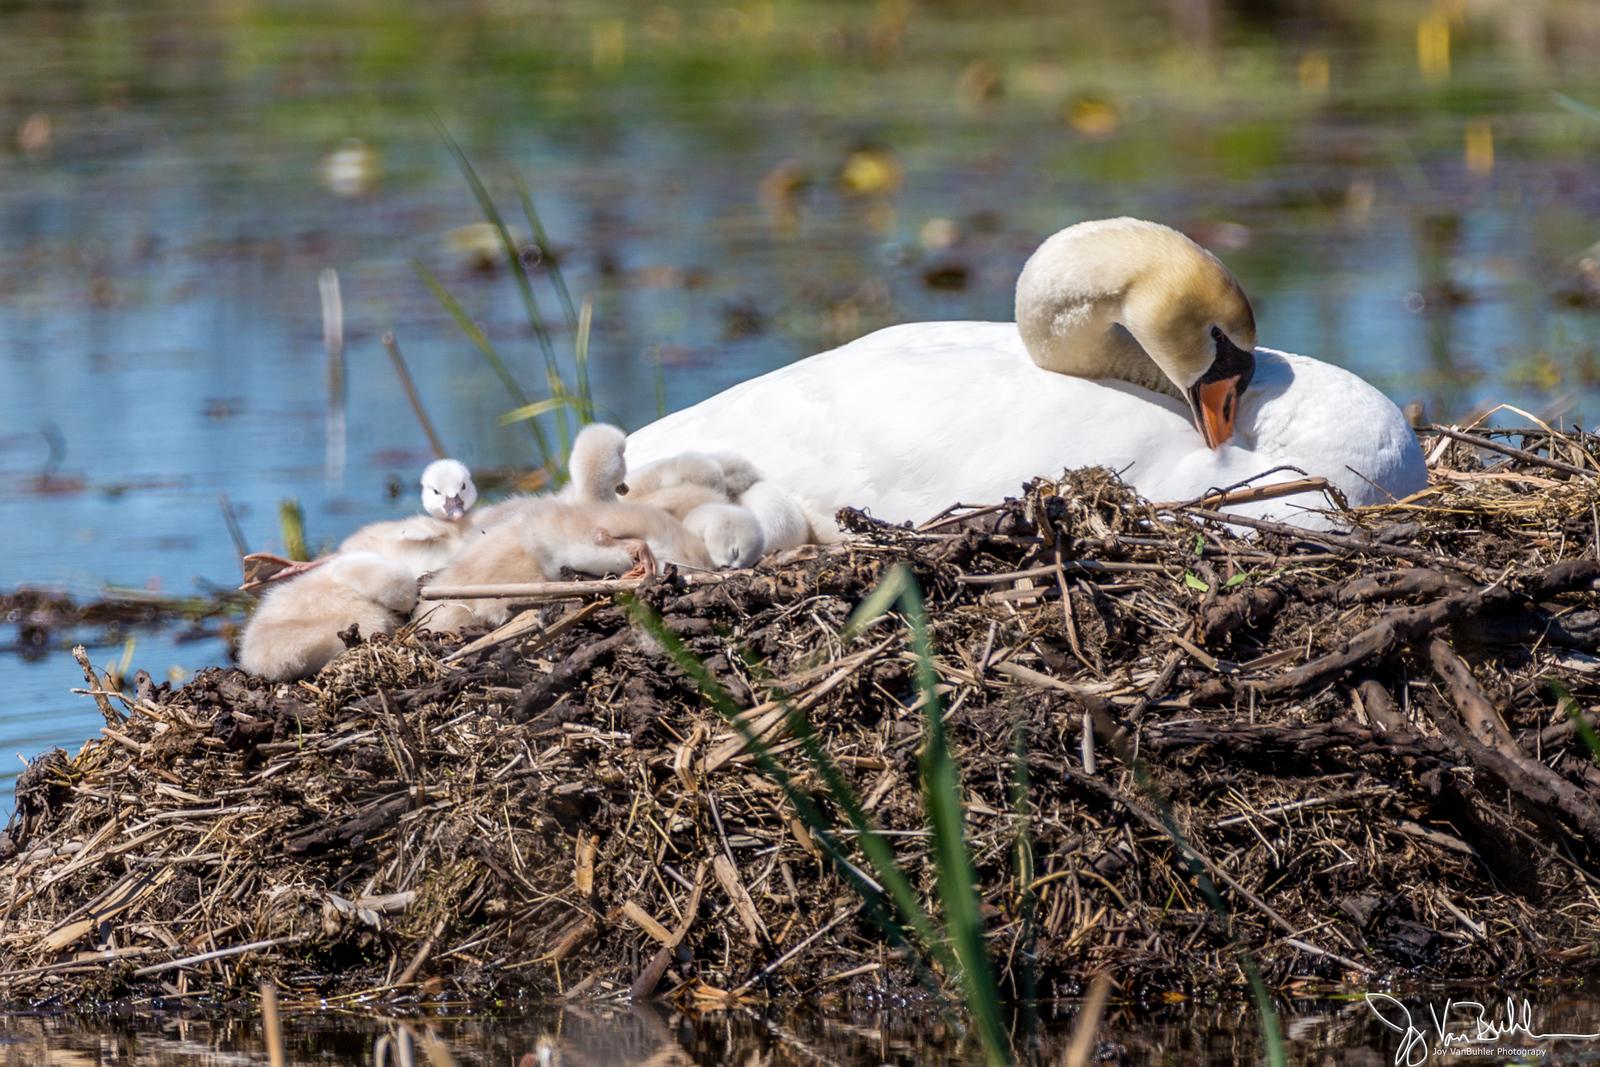 19/52-5: Swans